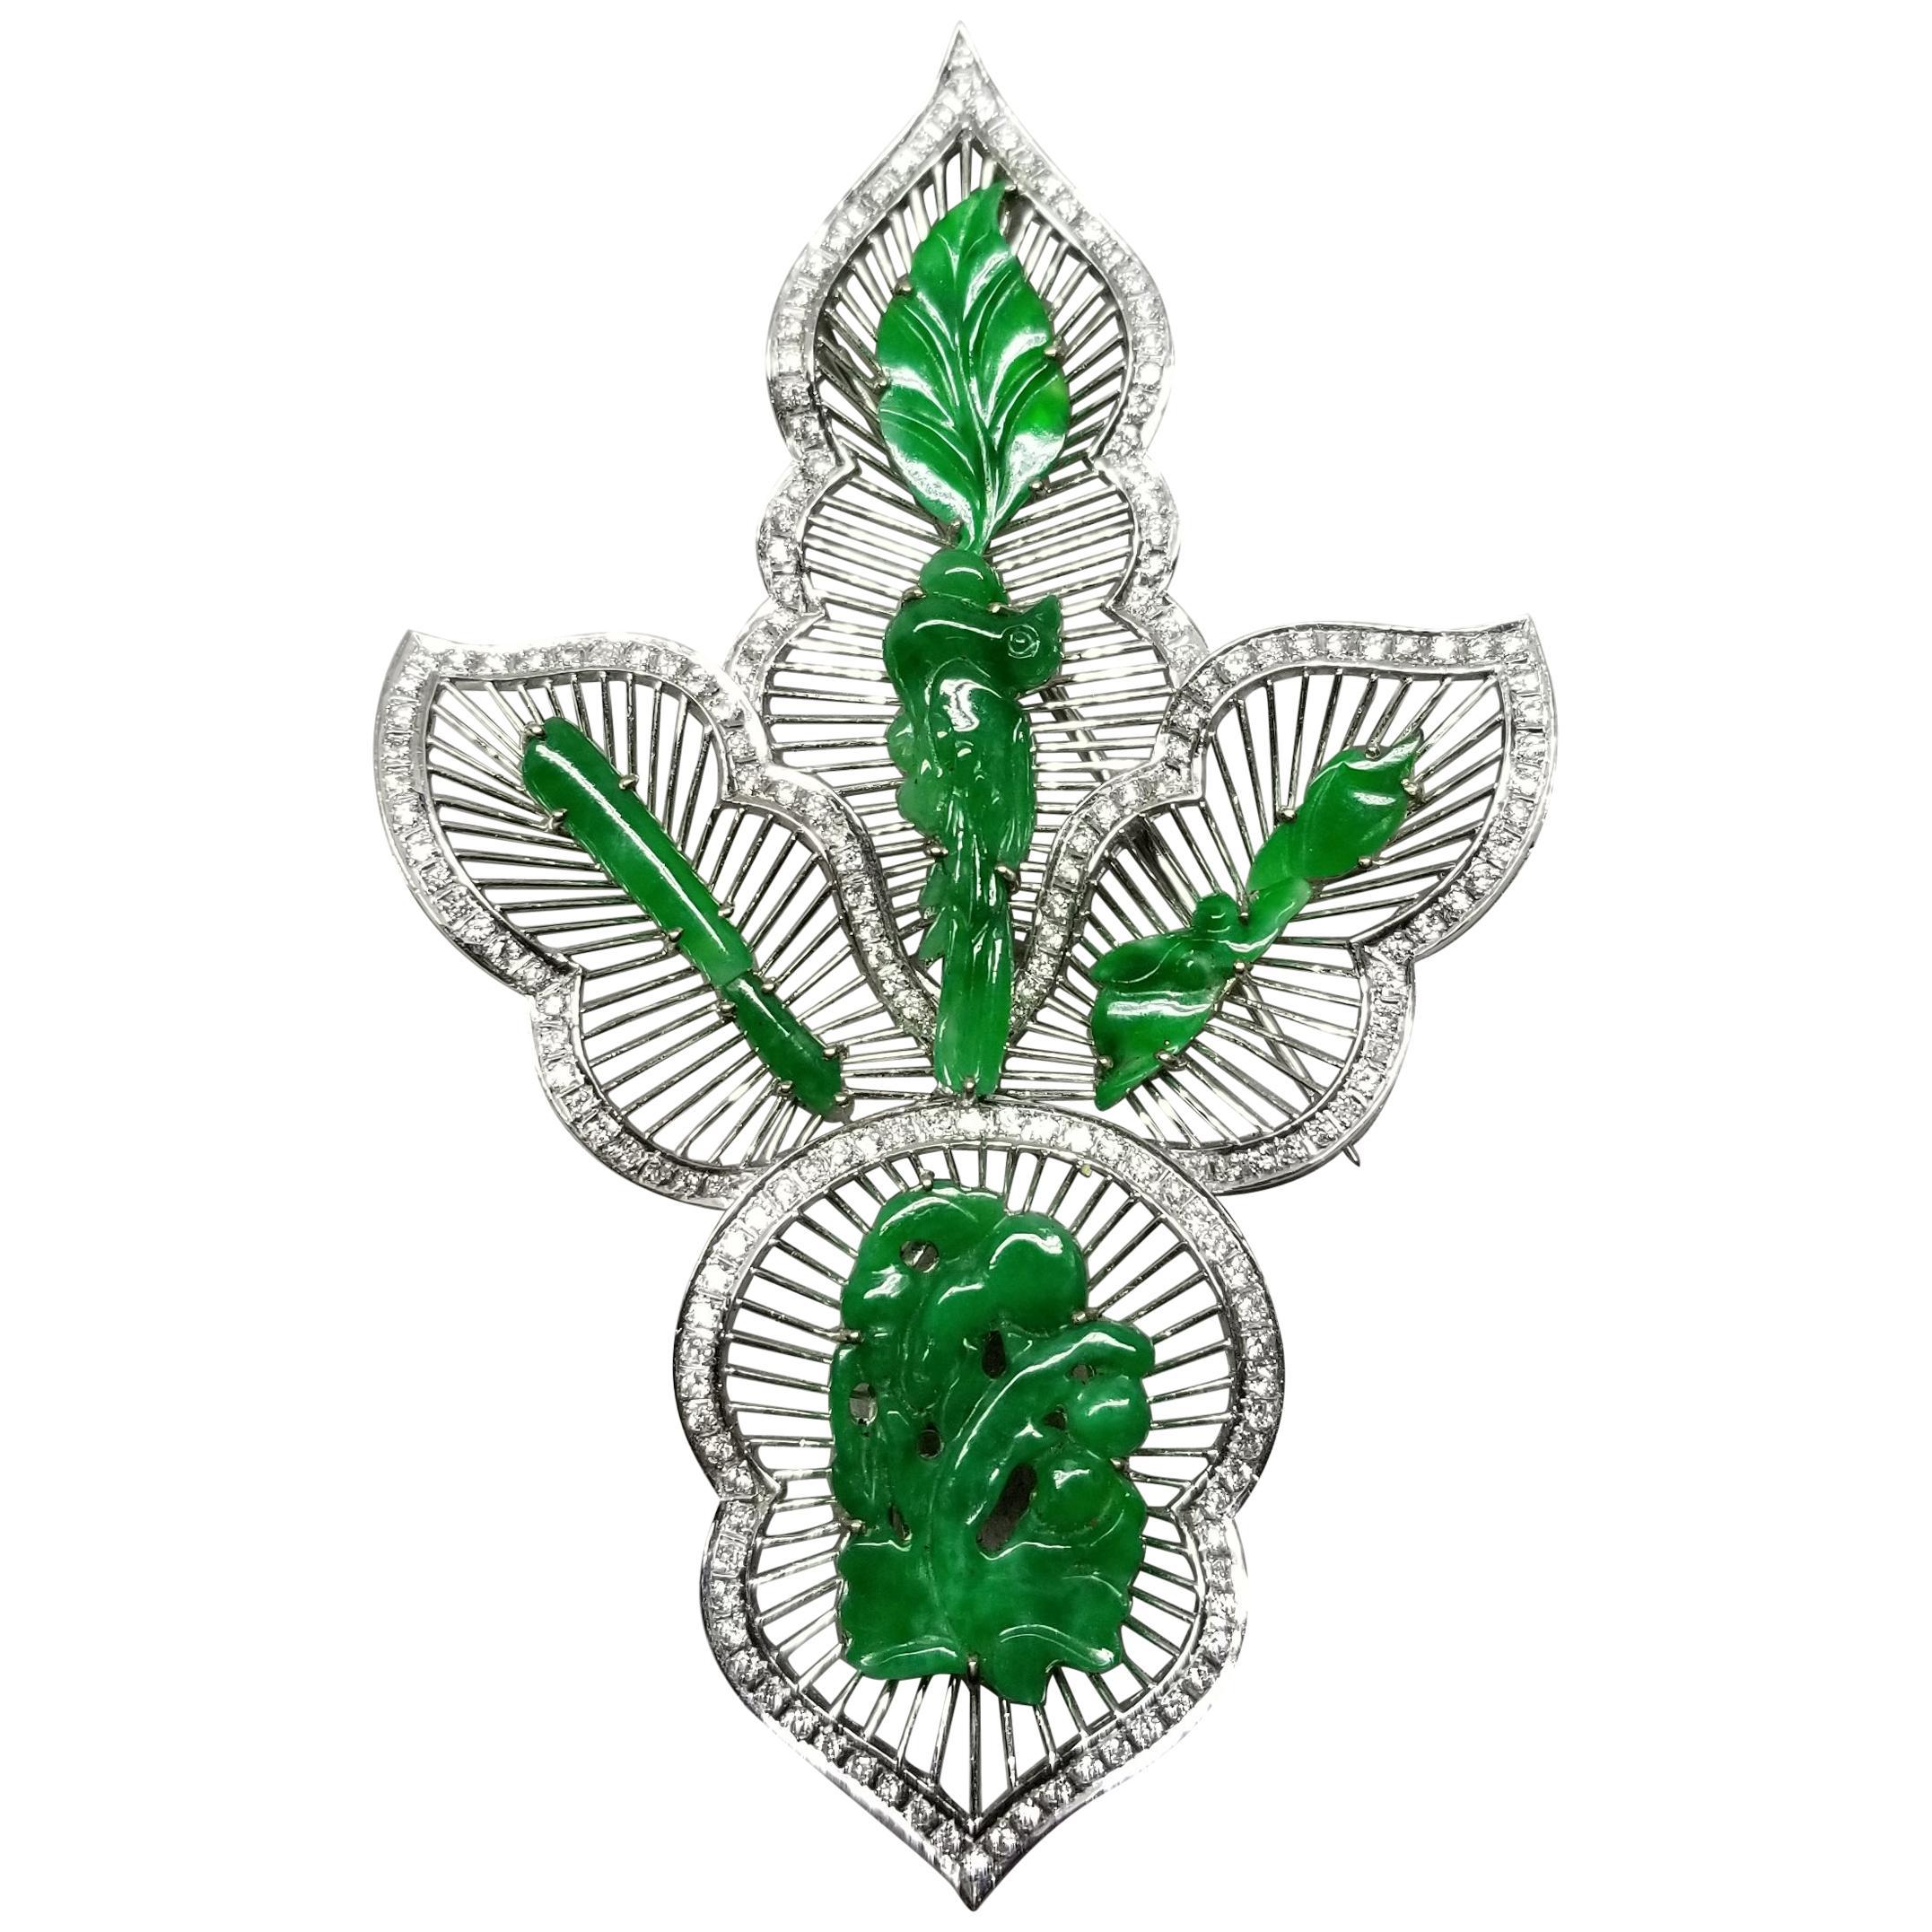 14 Karat White Gold Jade and Diamond Pin/Pendant